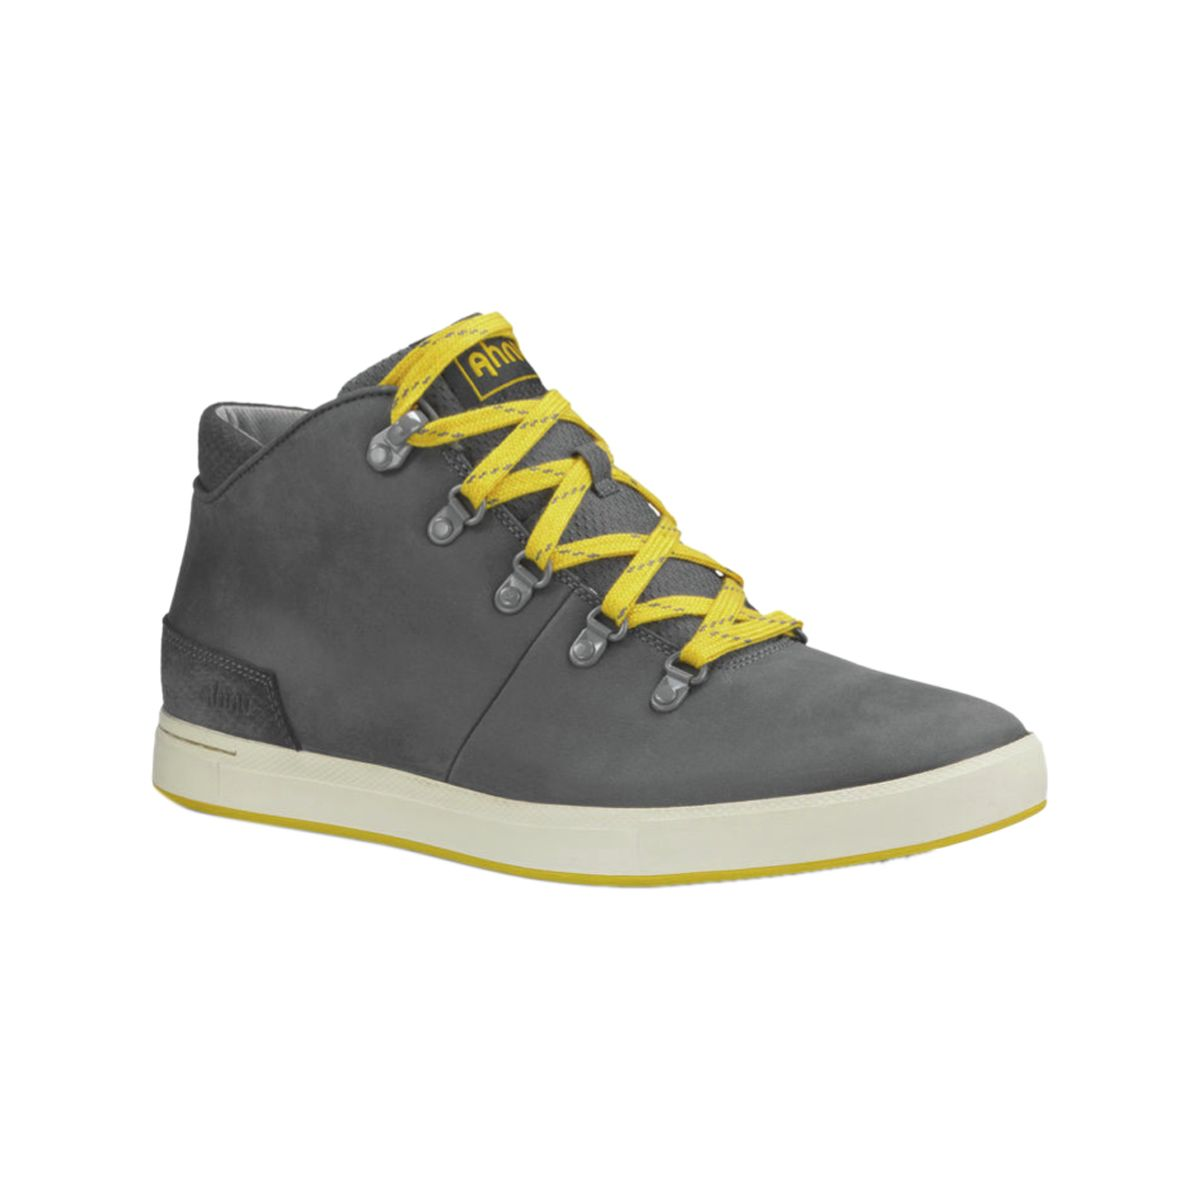 Ahnu Fulton Mid Shoe - Men's